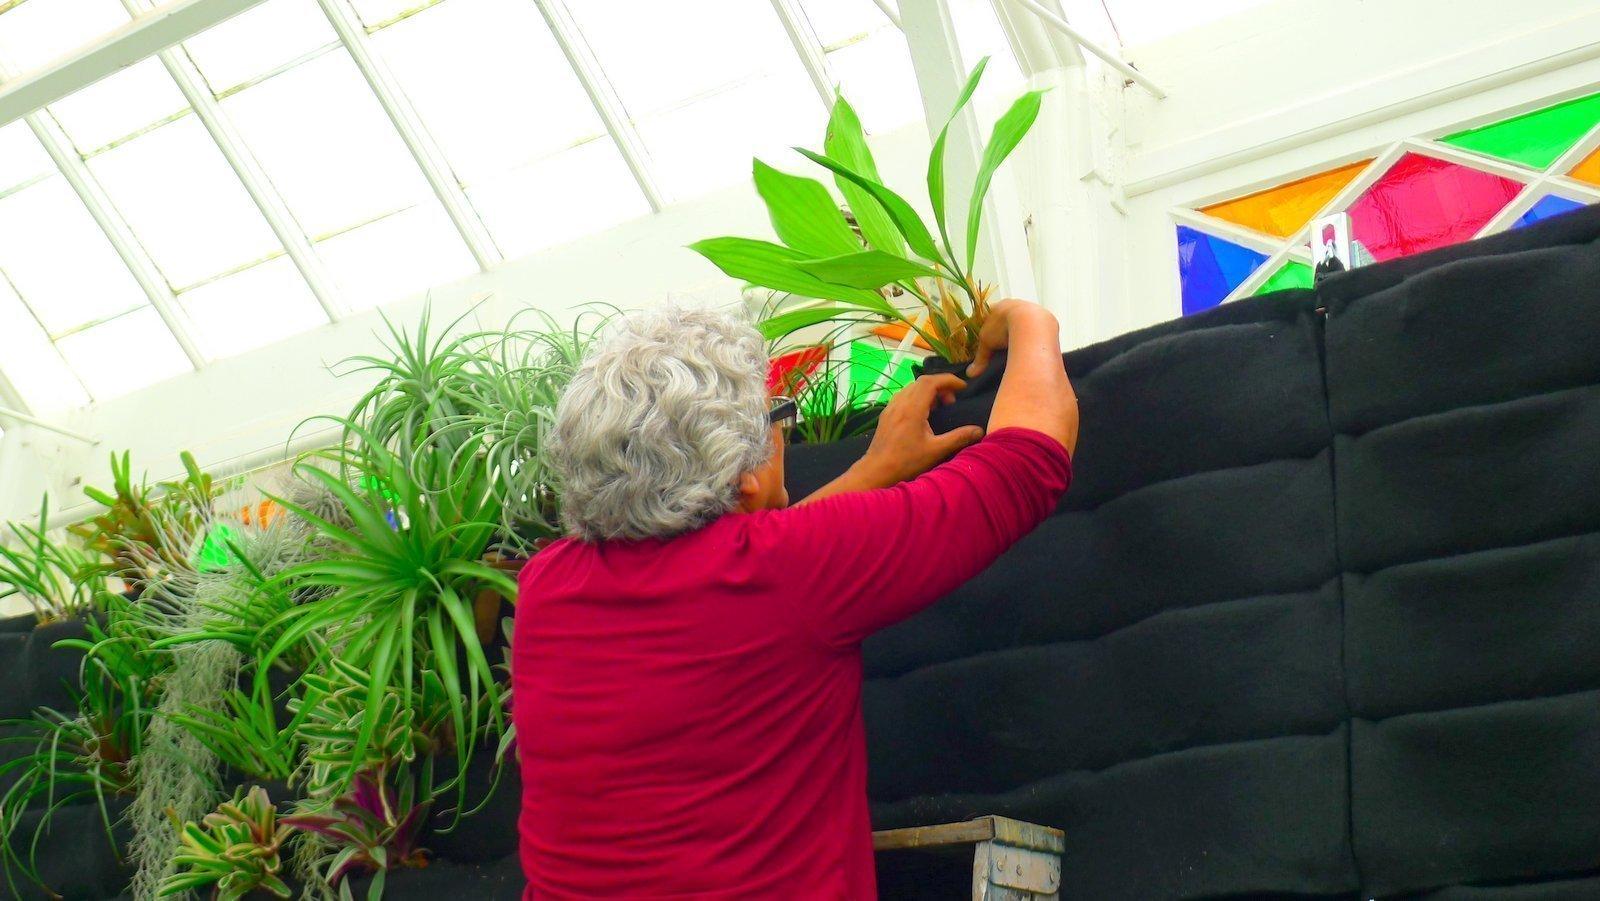 Guadalupe Cota San-Francisco-Conservatory Of Flowers. Florafelt Vertical Garden Planters.